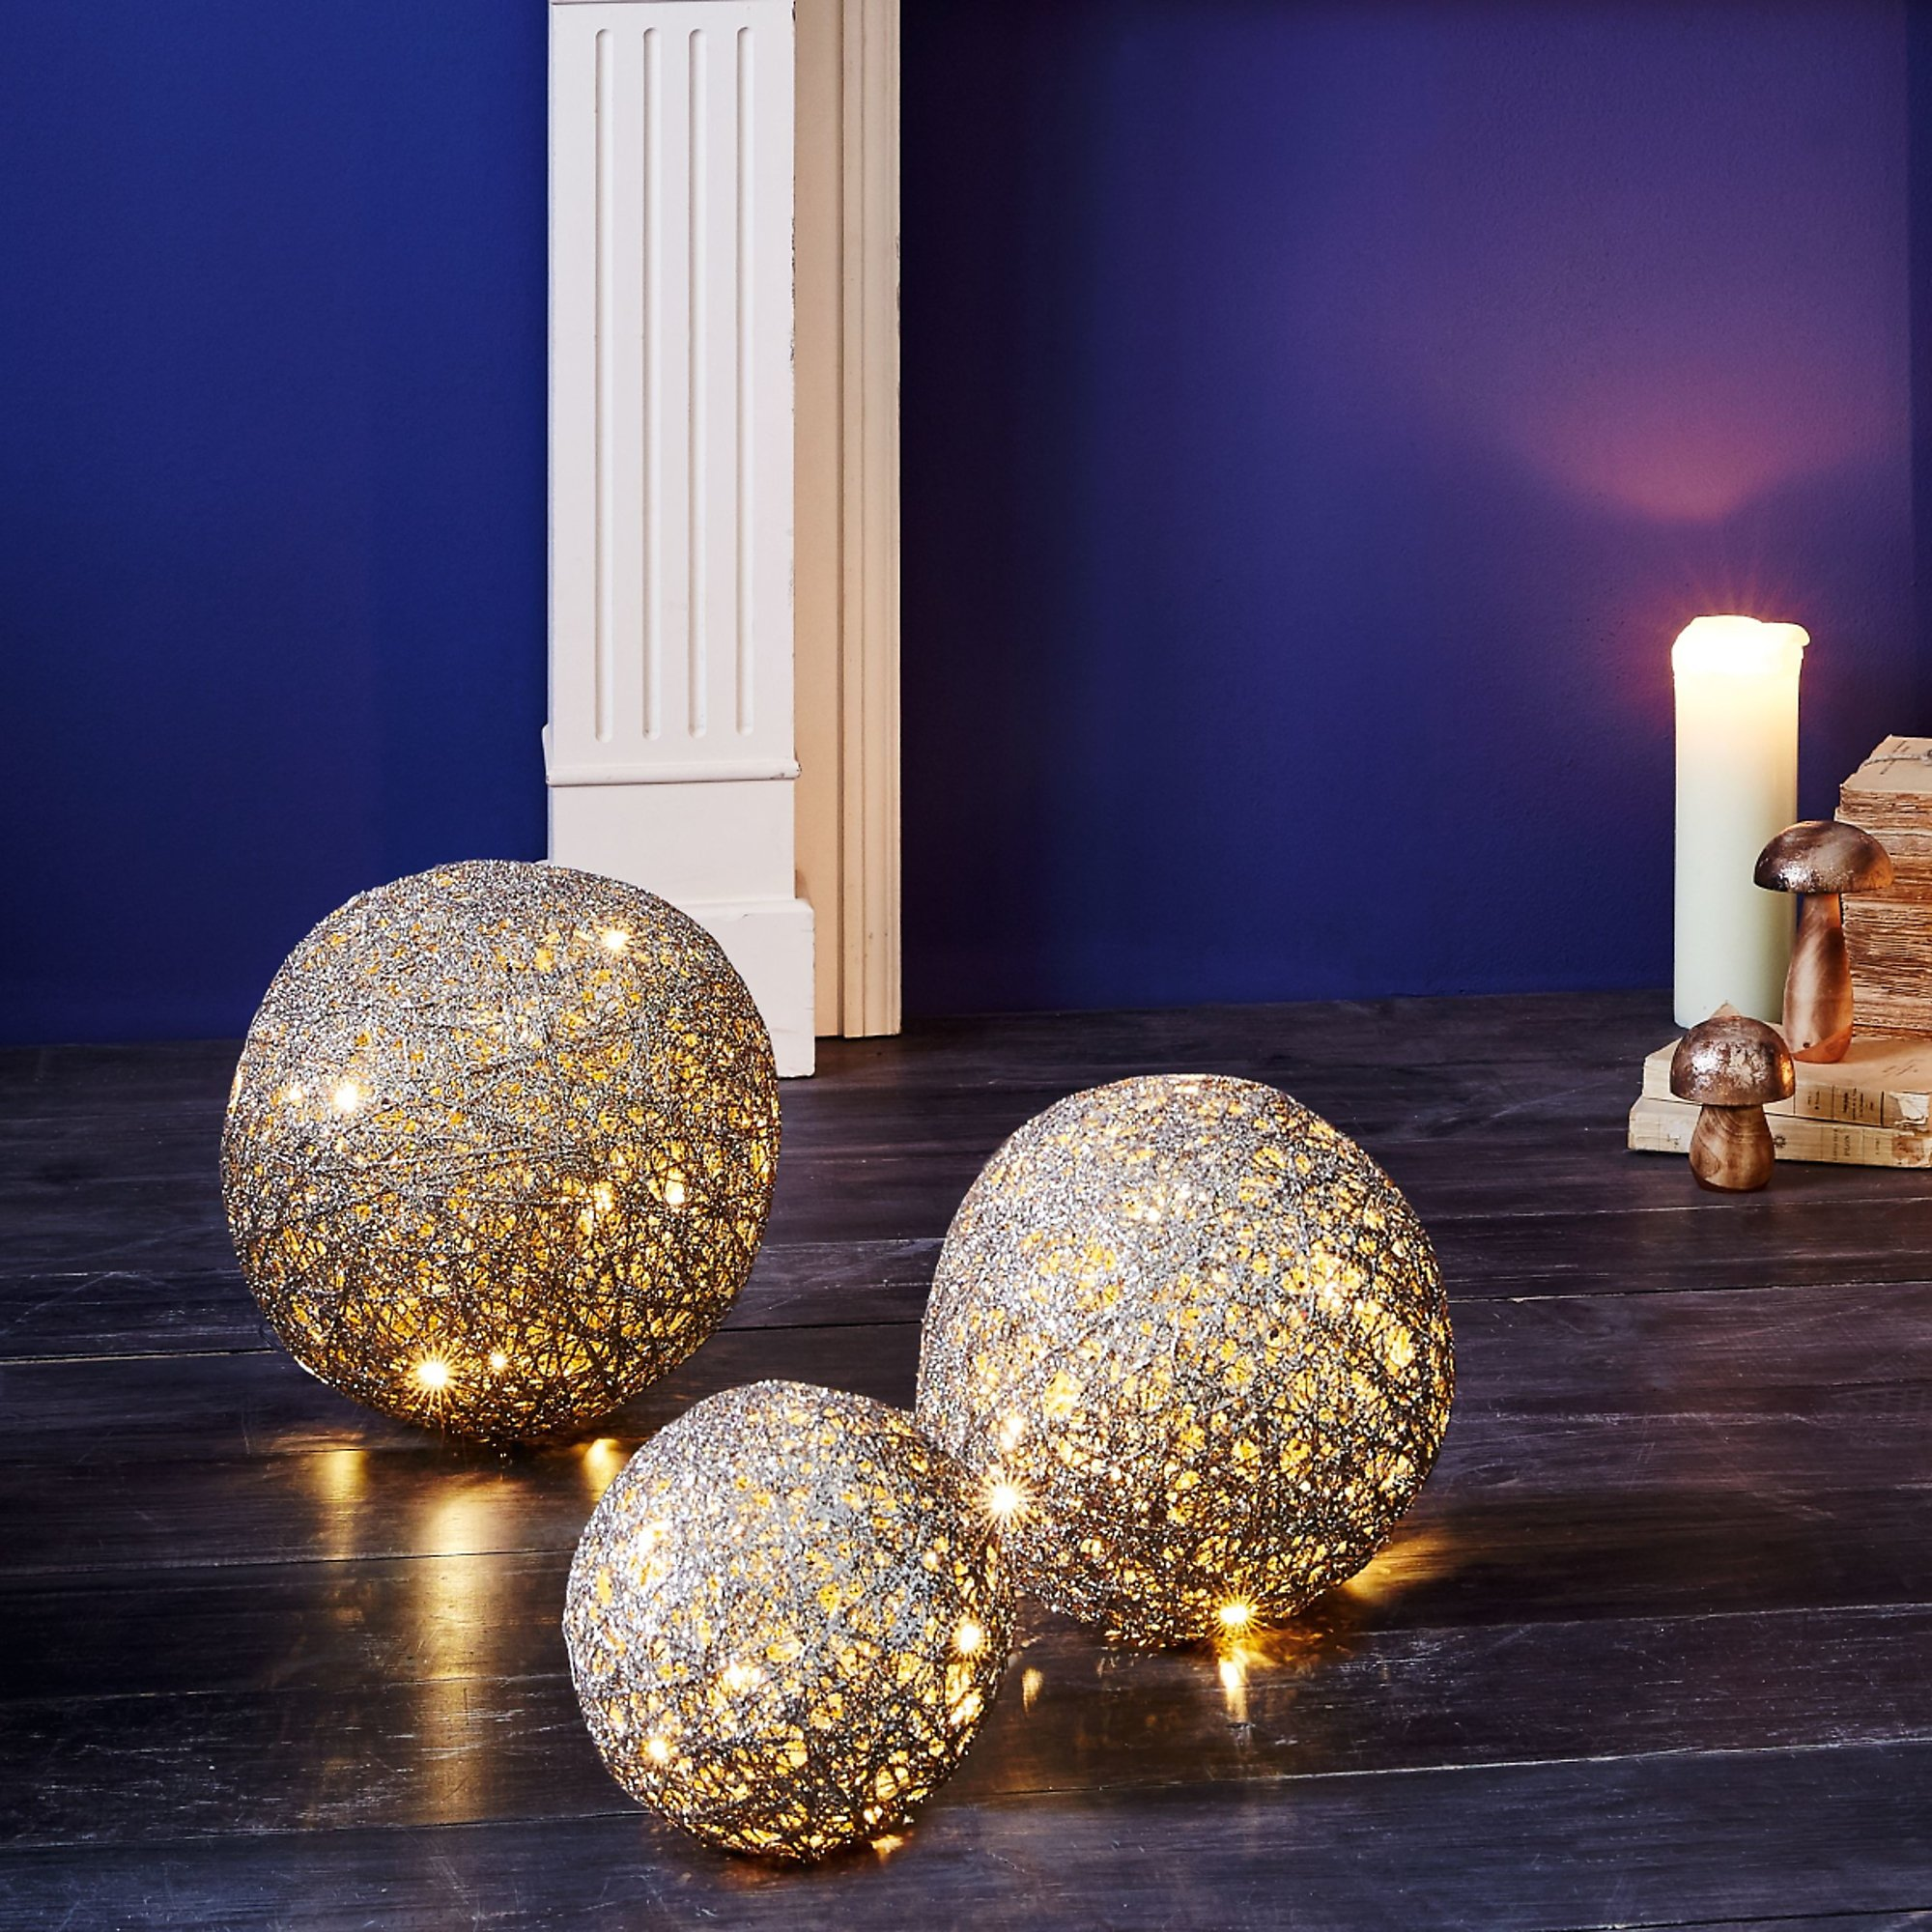 Beleuchtete Weihnachtskugeln.Beleuchtete Dekokugel Mit Leds Batteriebetrieben Weltbild De